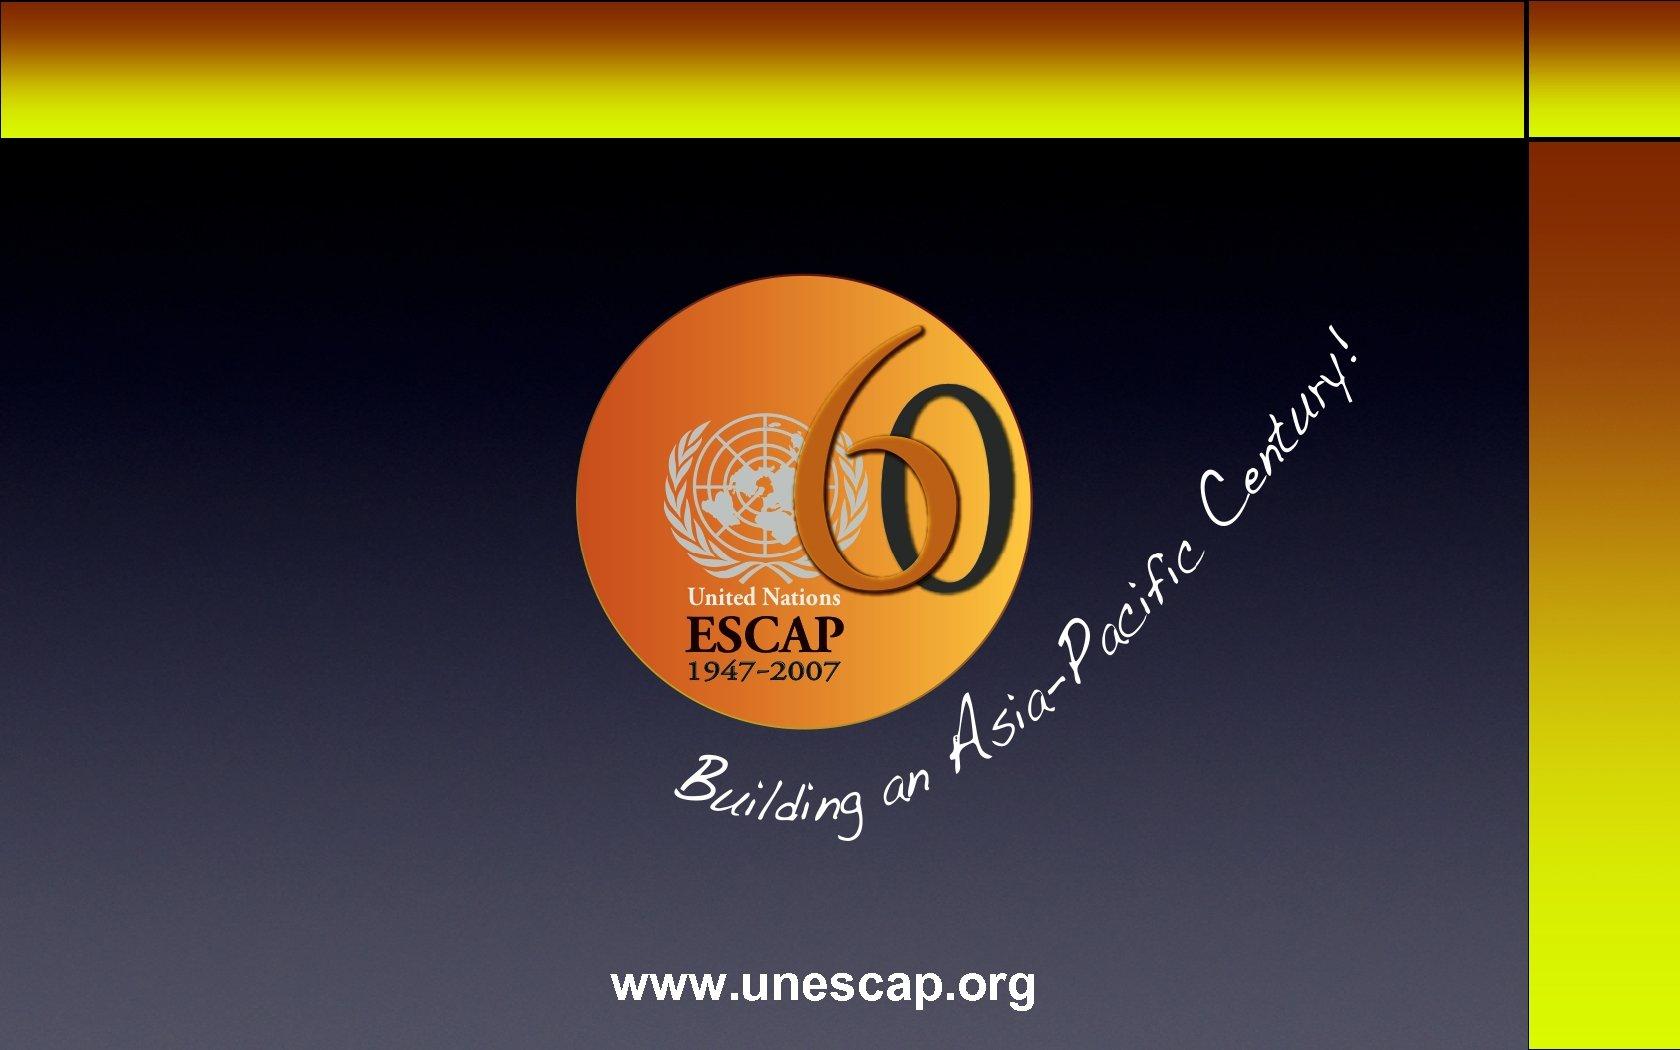 Thank you www. unescap. org